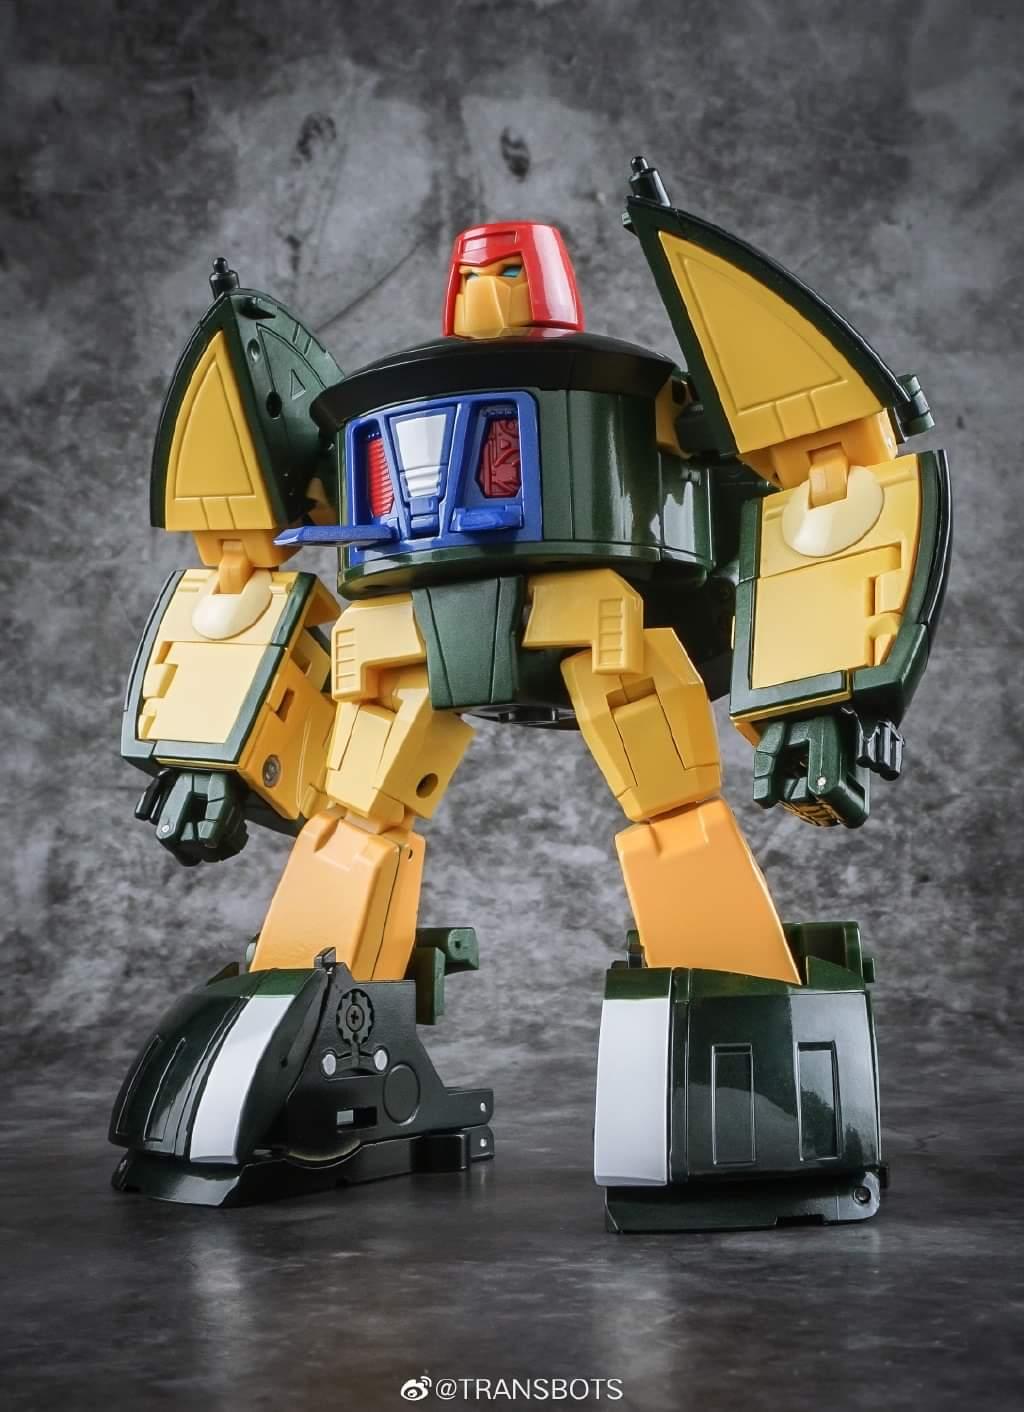 [X-Transbots] Produit Tiers - Minibots MP - Gamme MM - Page 12 U7ocPLyZ_o